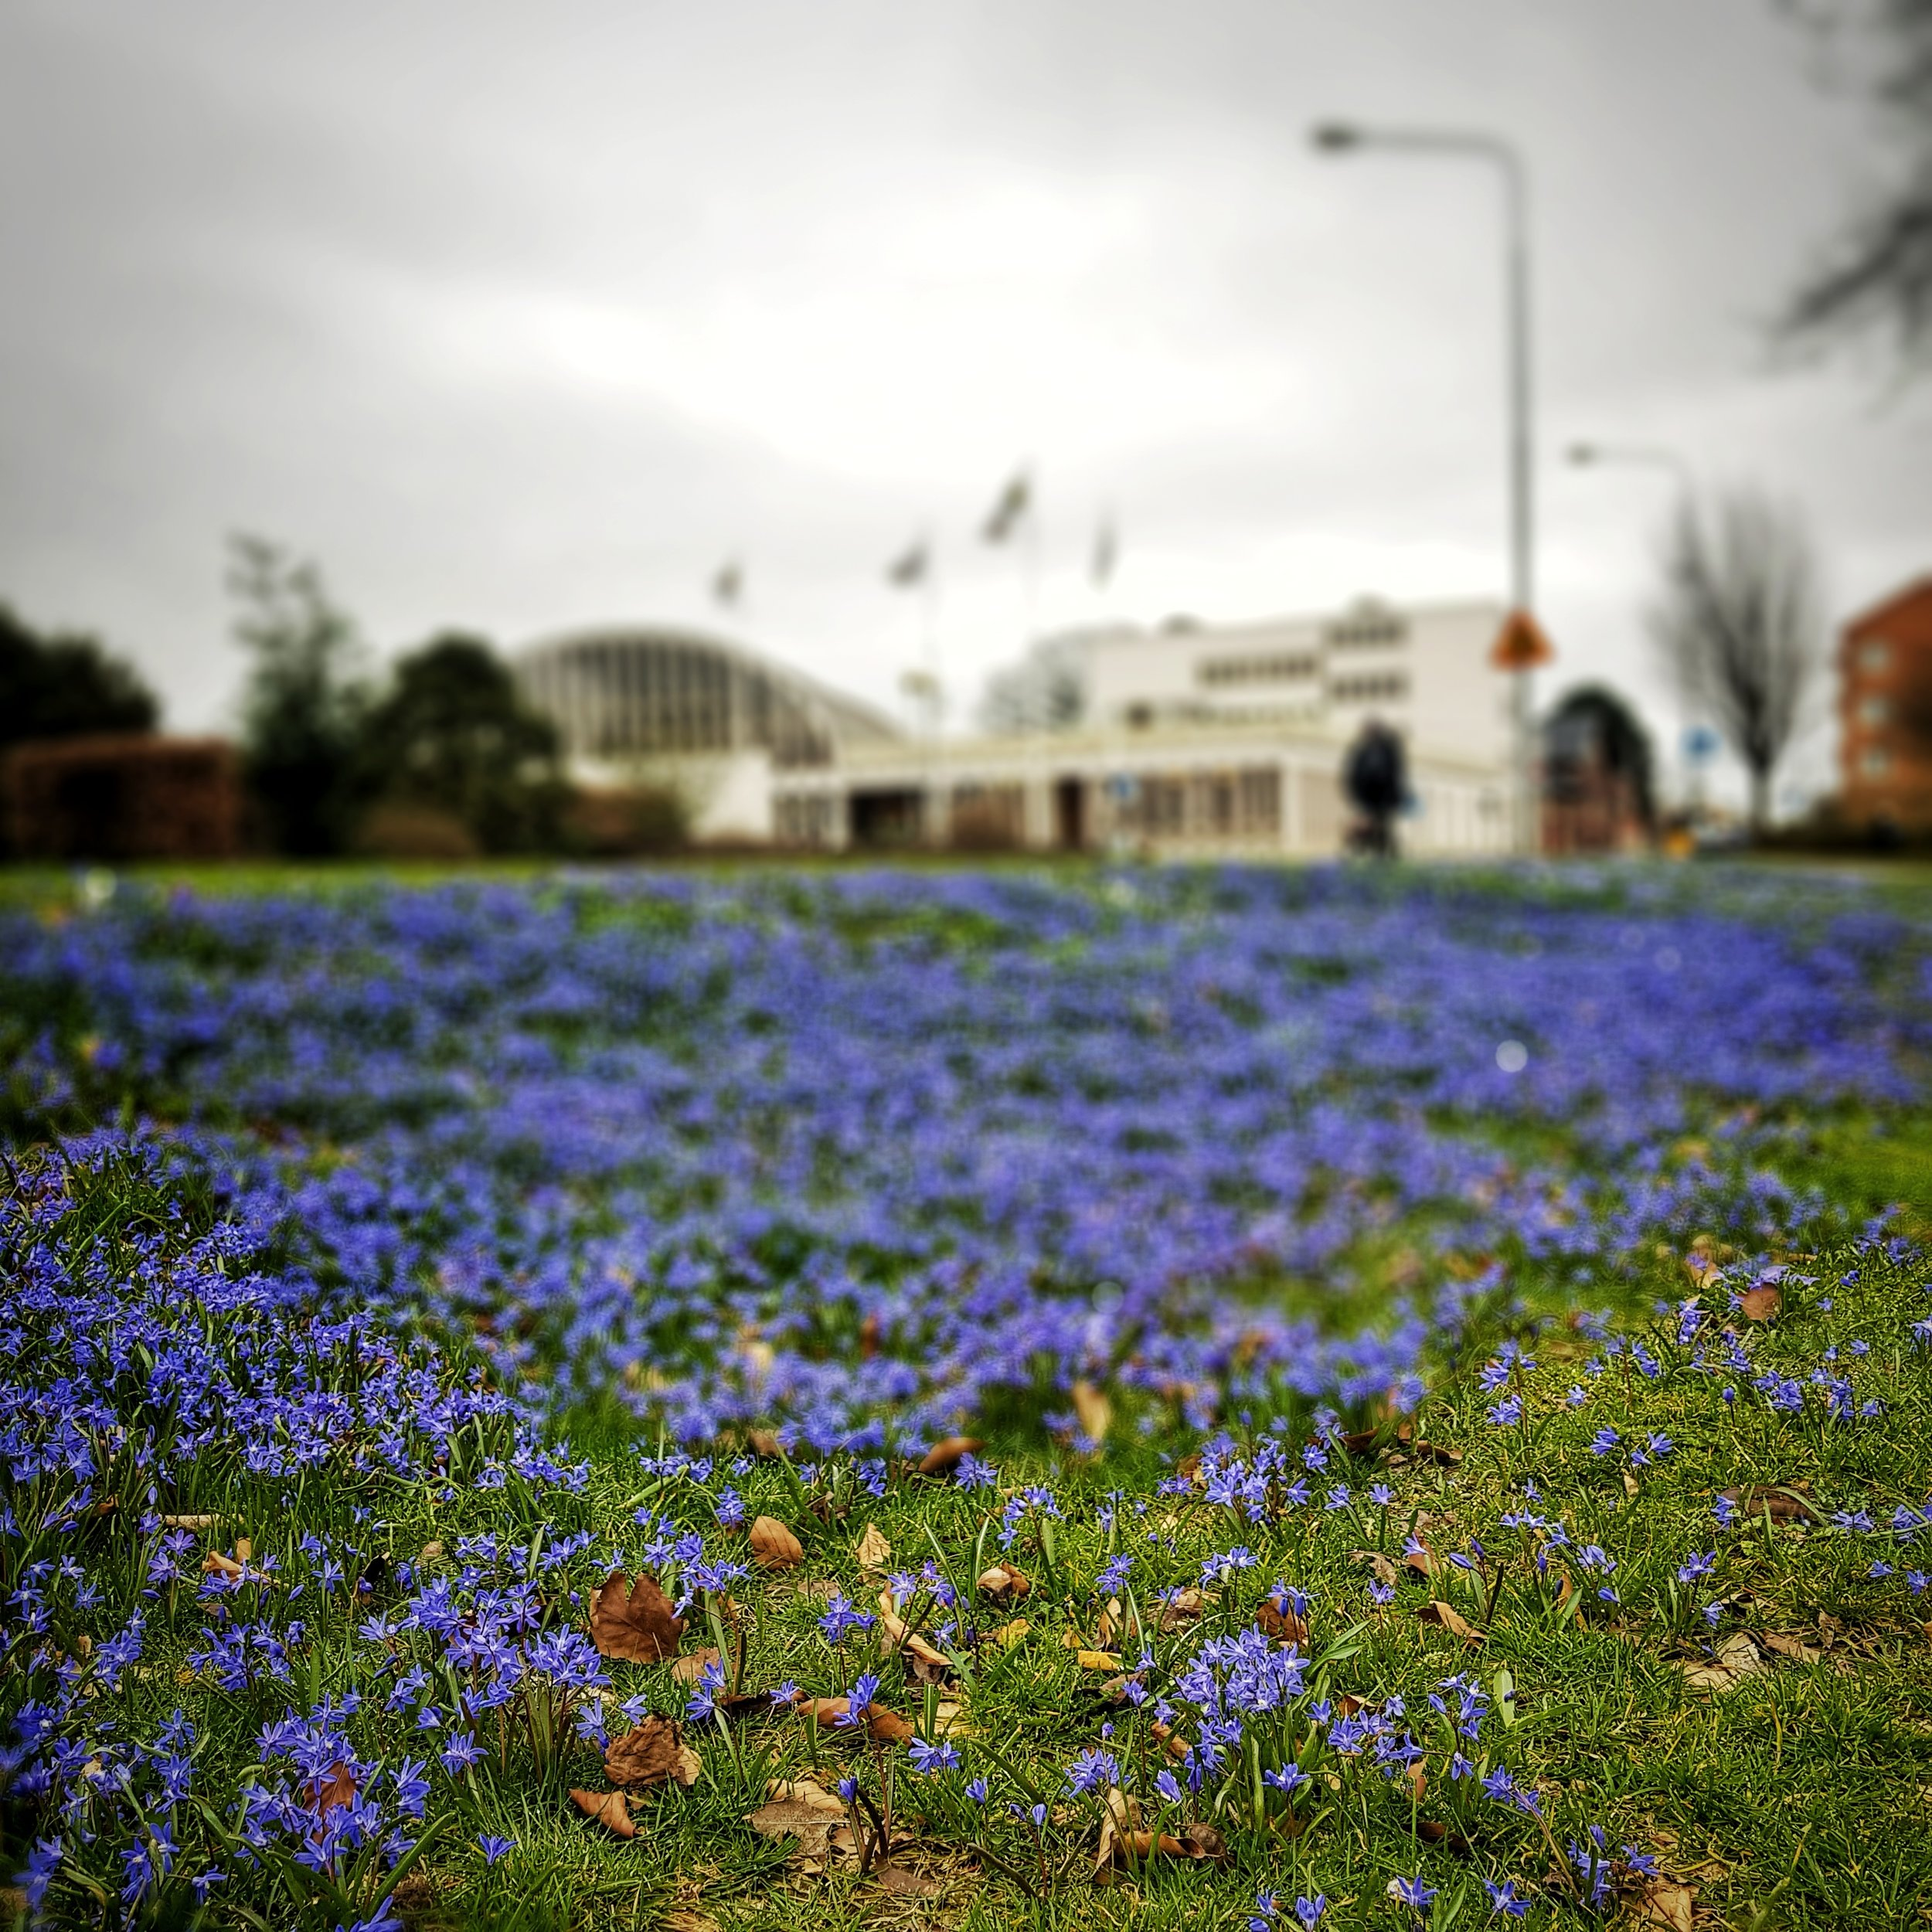 Day 103 - April 13: Blue Spring